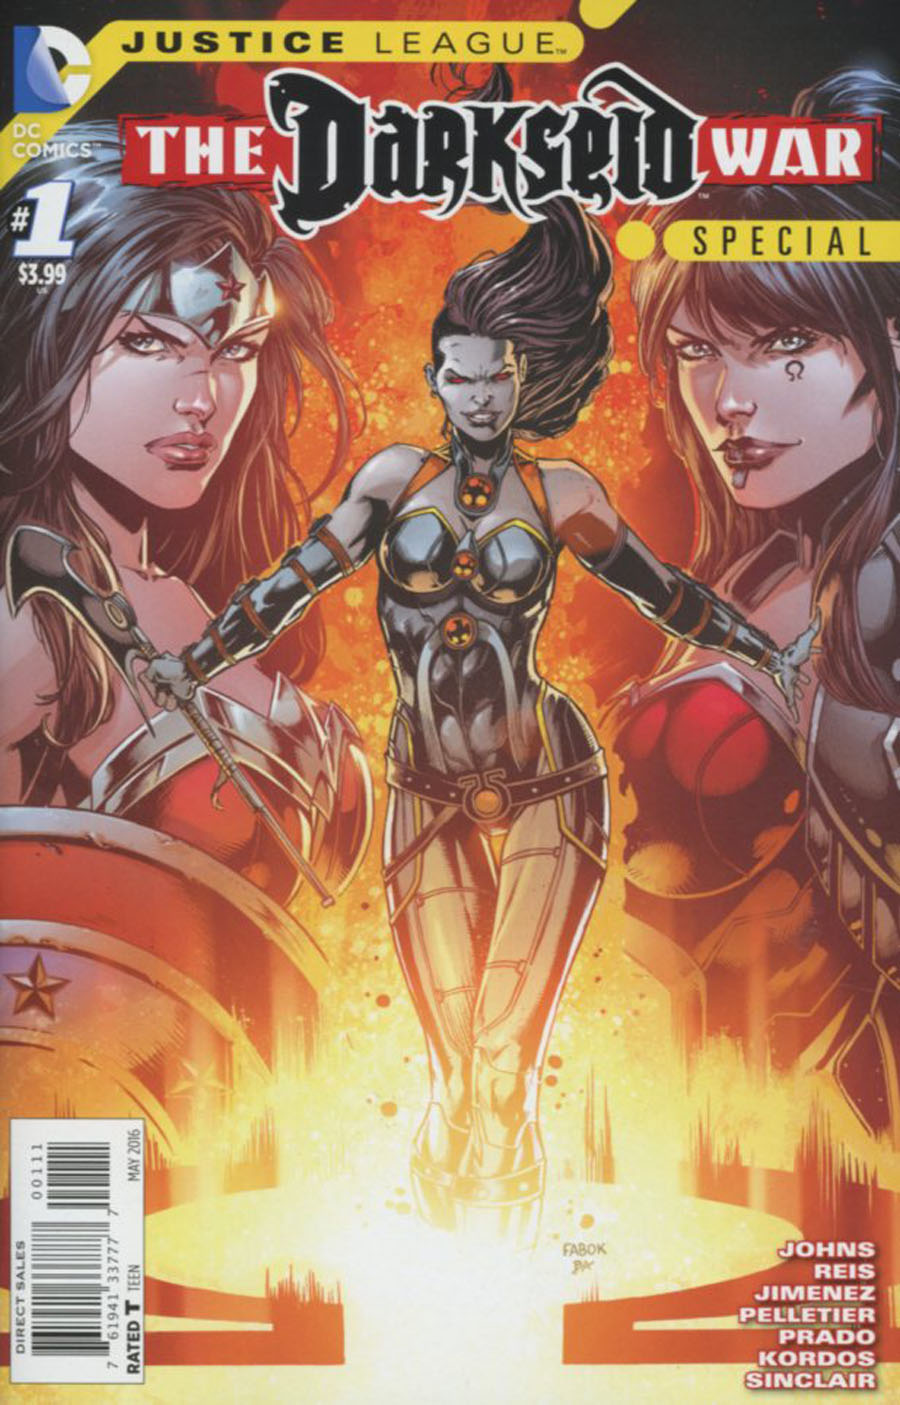 Justice League Darkseid War Special #1 Cover A Regular Jason Fabok Cover